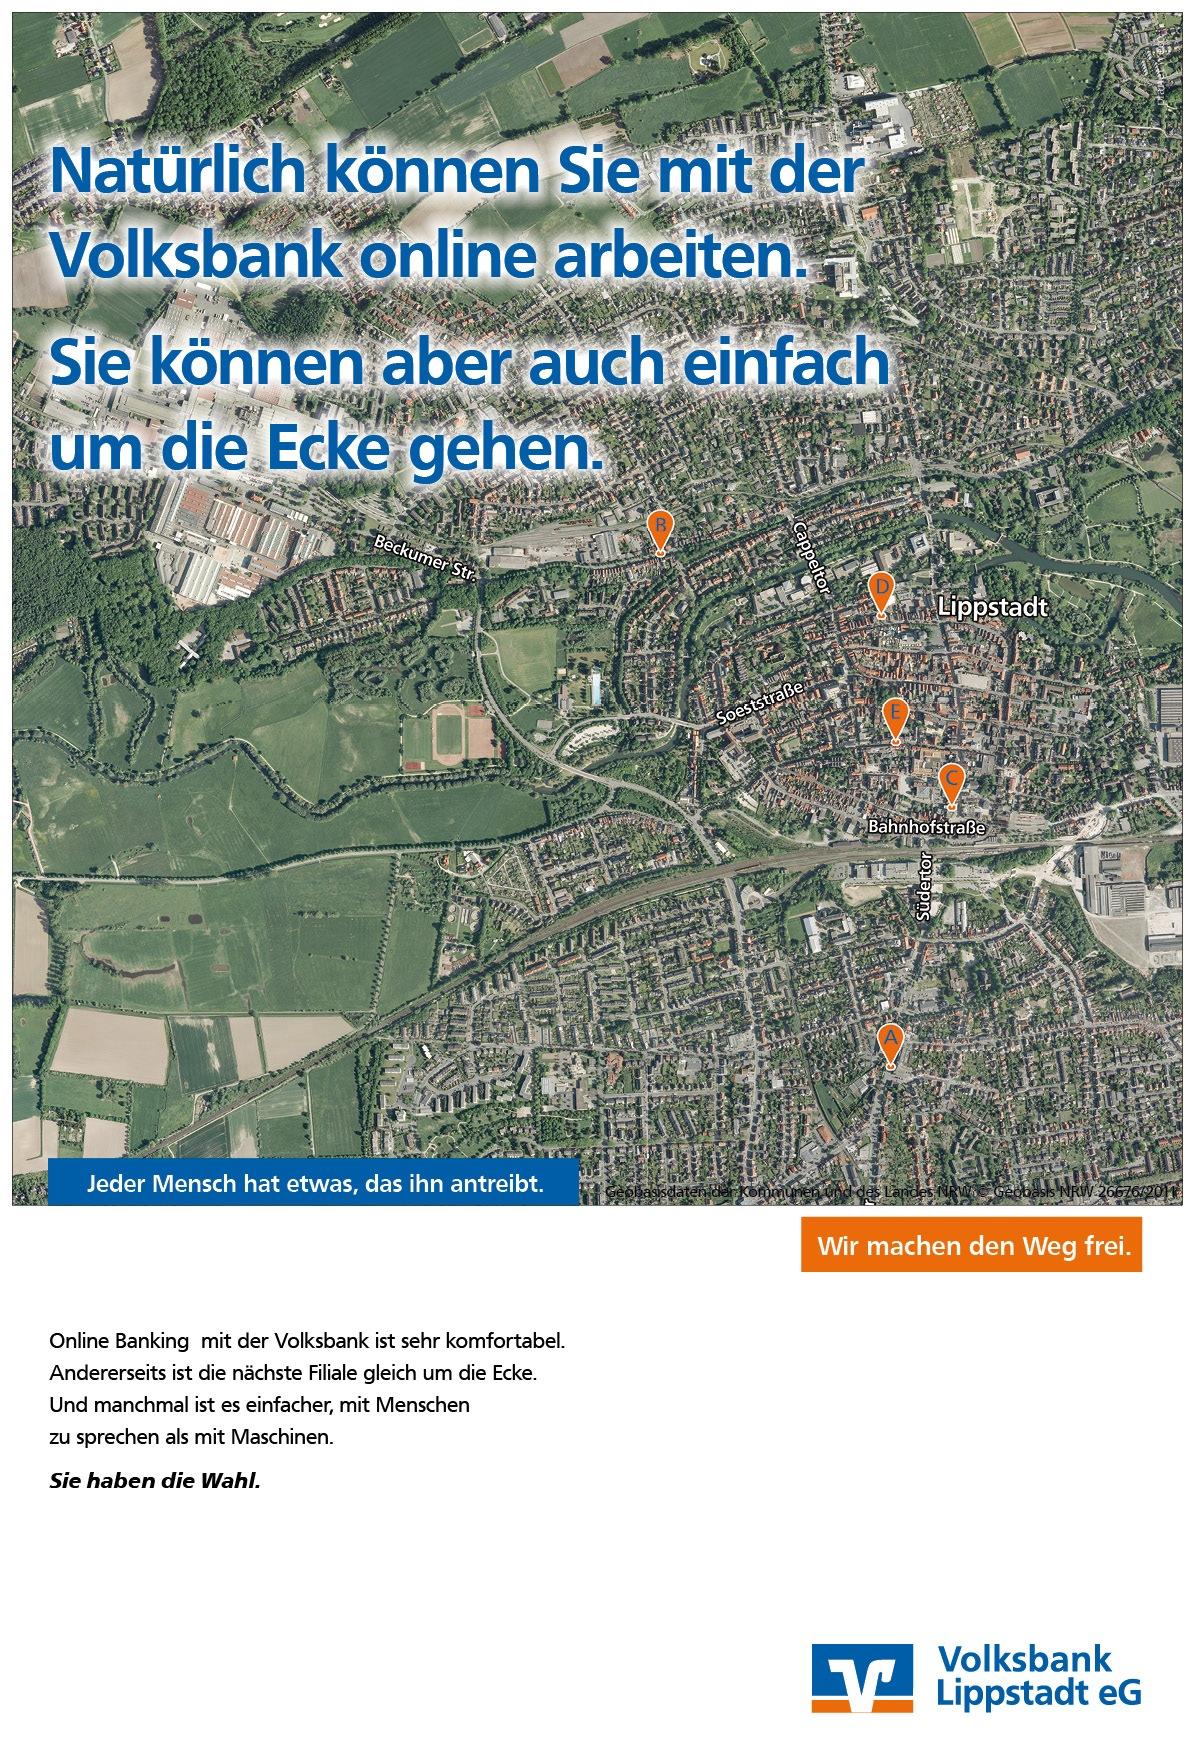 Marketingkampagne Volksbank Lippstadt